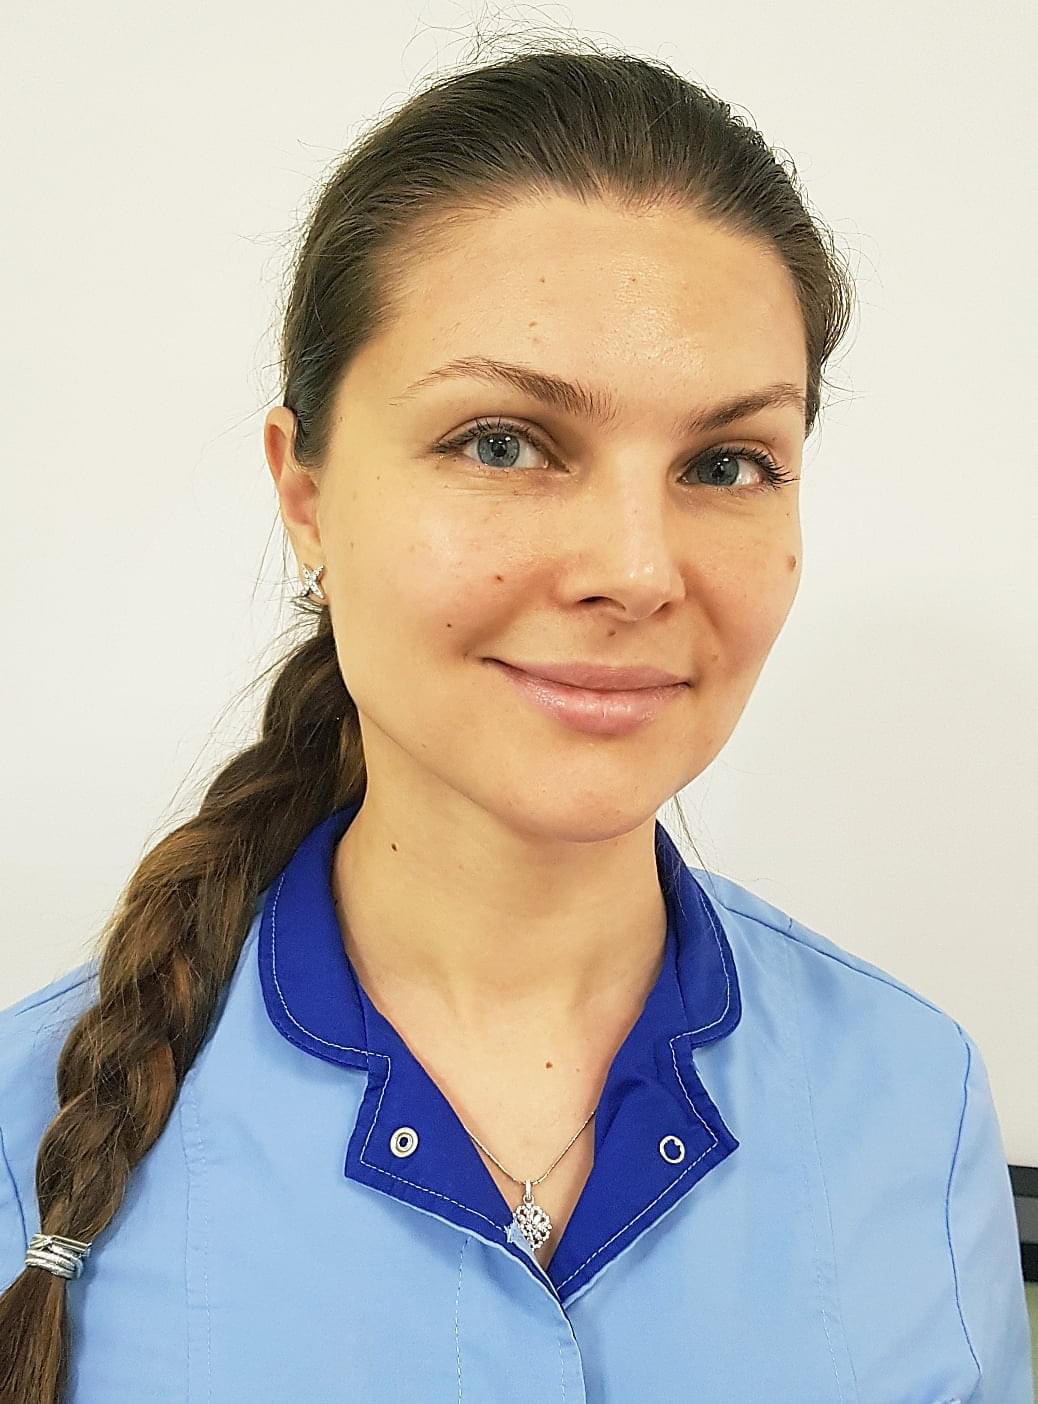 Тарасова Катерина Викторовна : Врач стоматолог-ортодонт